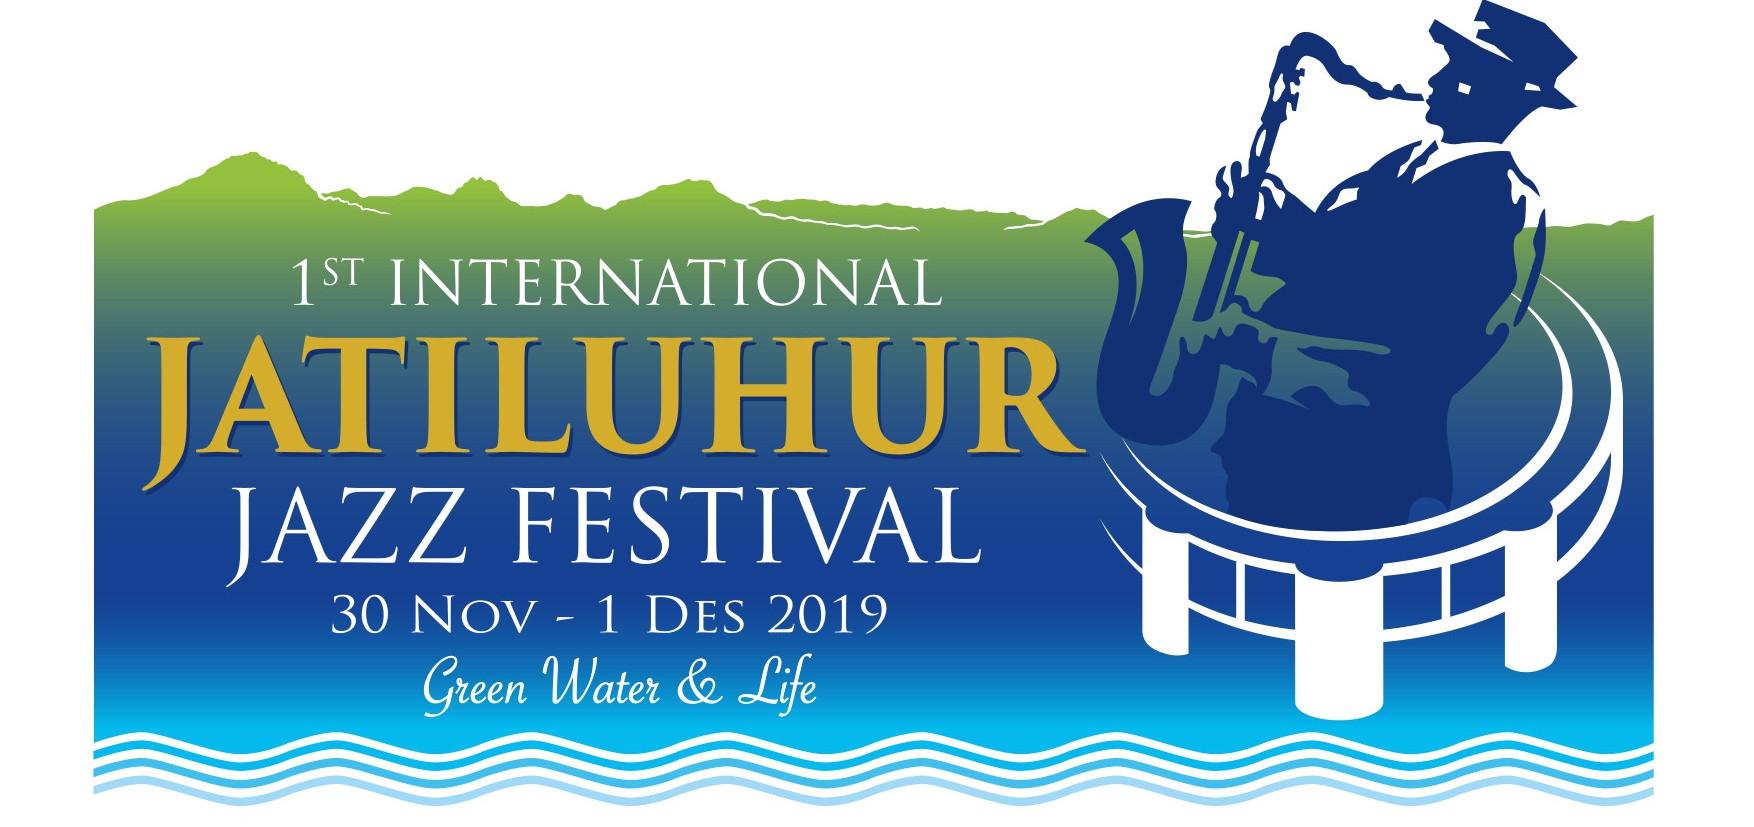 The 1st International Jatiluhur Jazz Festival 2019